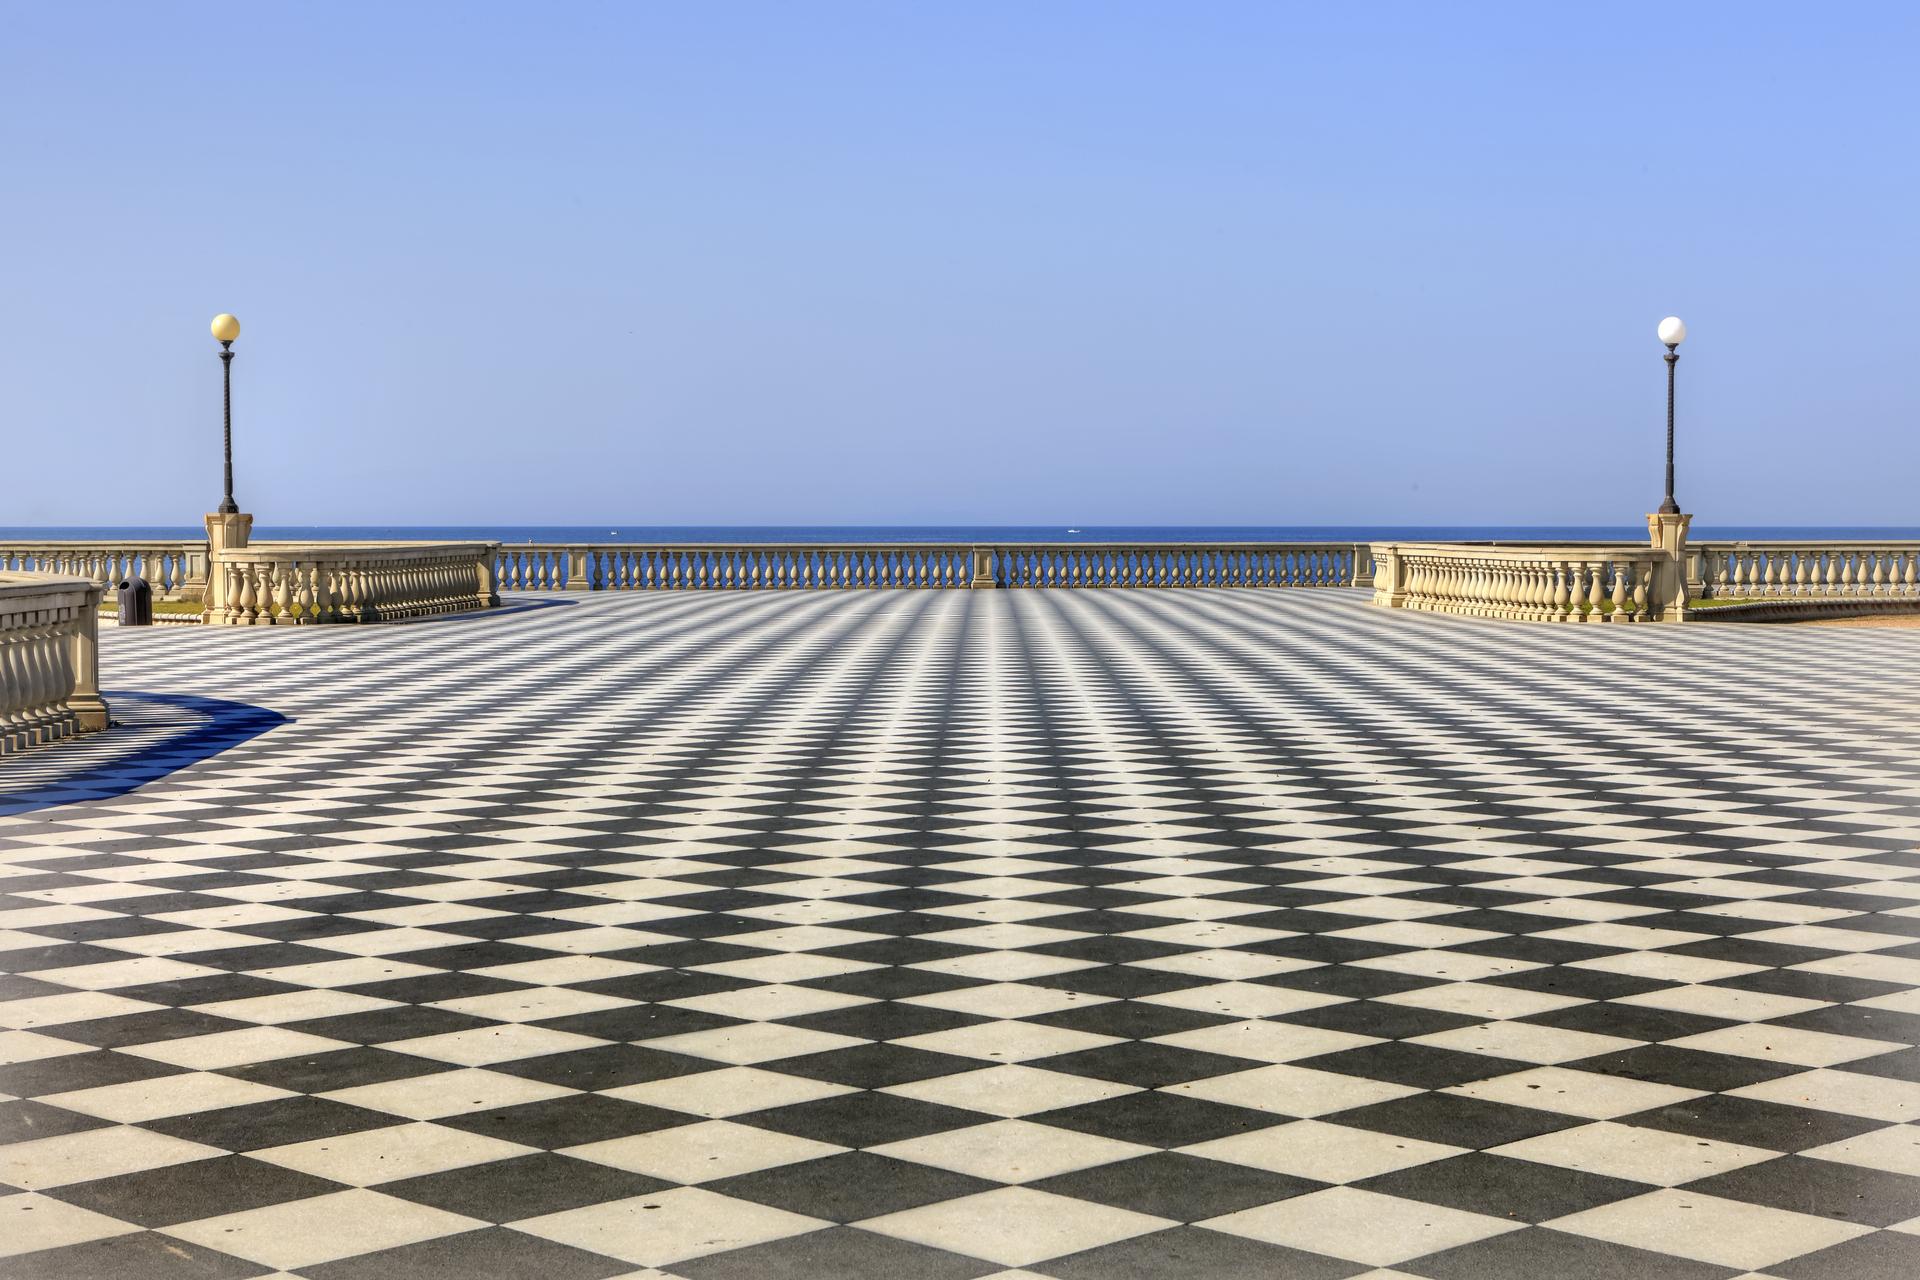 Livorno-by-Joana-Kruse-Downloaded-from-500px1.jpg